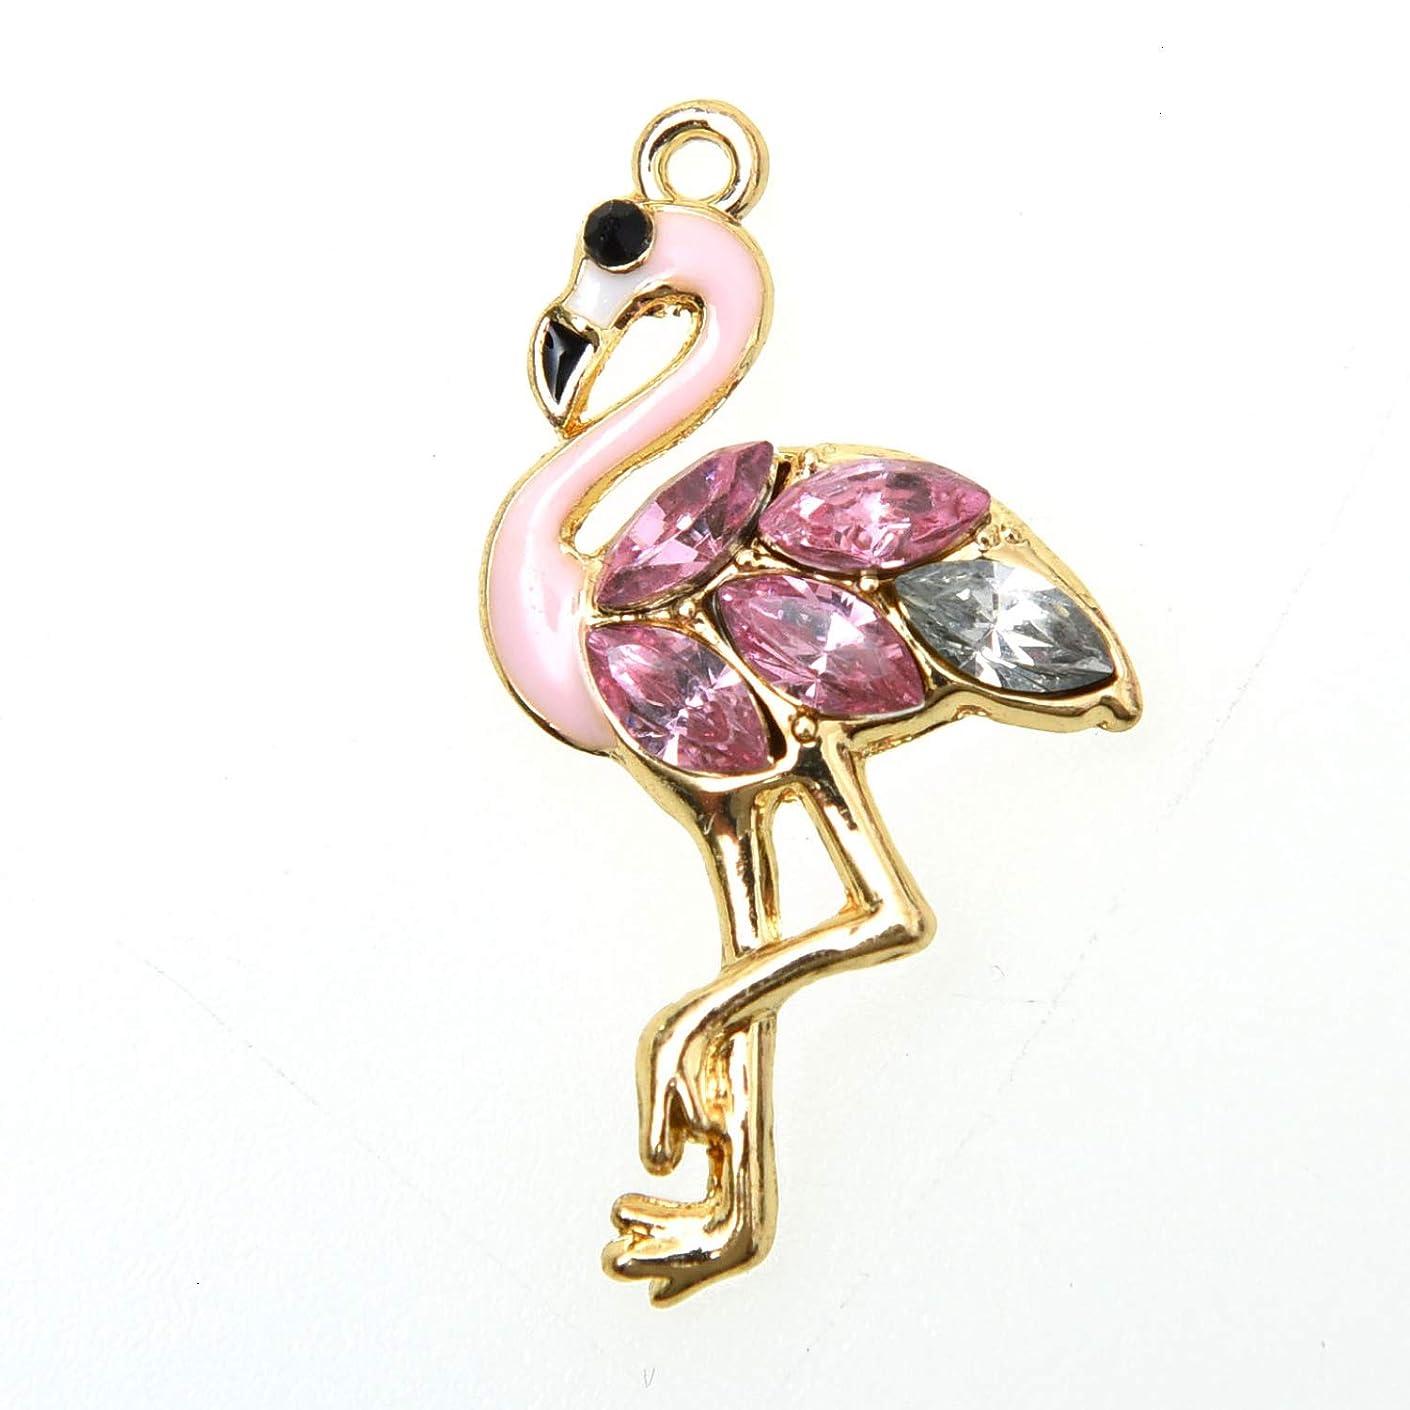 Monrocco 20 Pack Crystal Rhinestone Flamingo Enamel Charms Pendant for Bracelets Jewelry Making